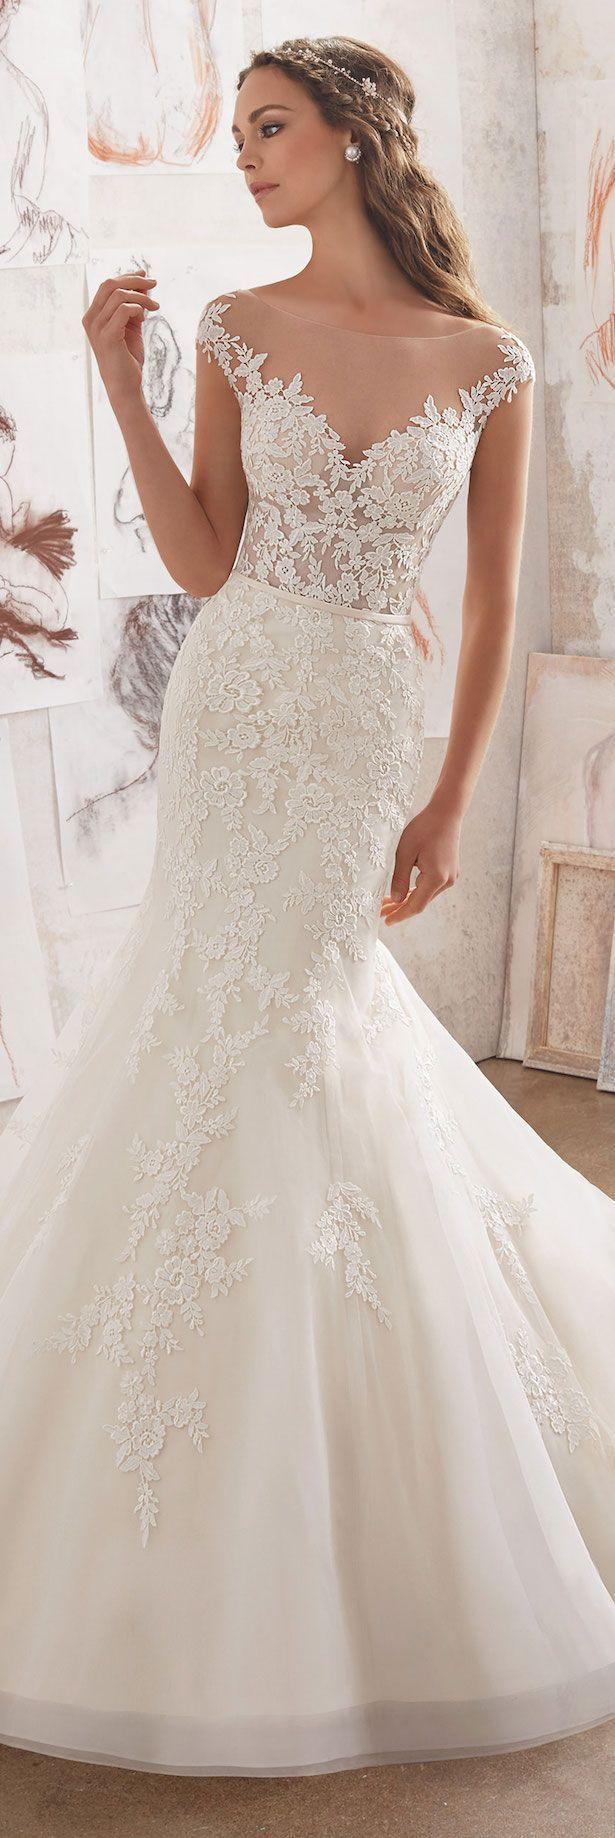 Mori Lee by Madeline Gardner Wedding Dress Collection Blu Spring 2017